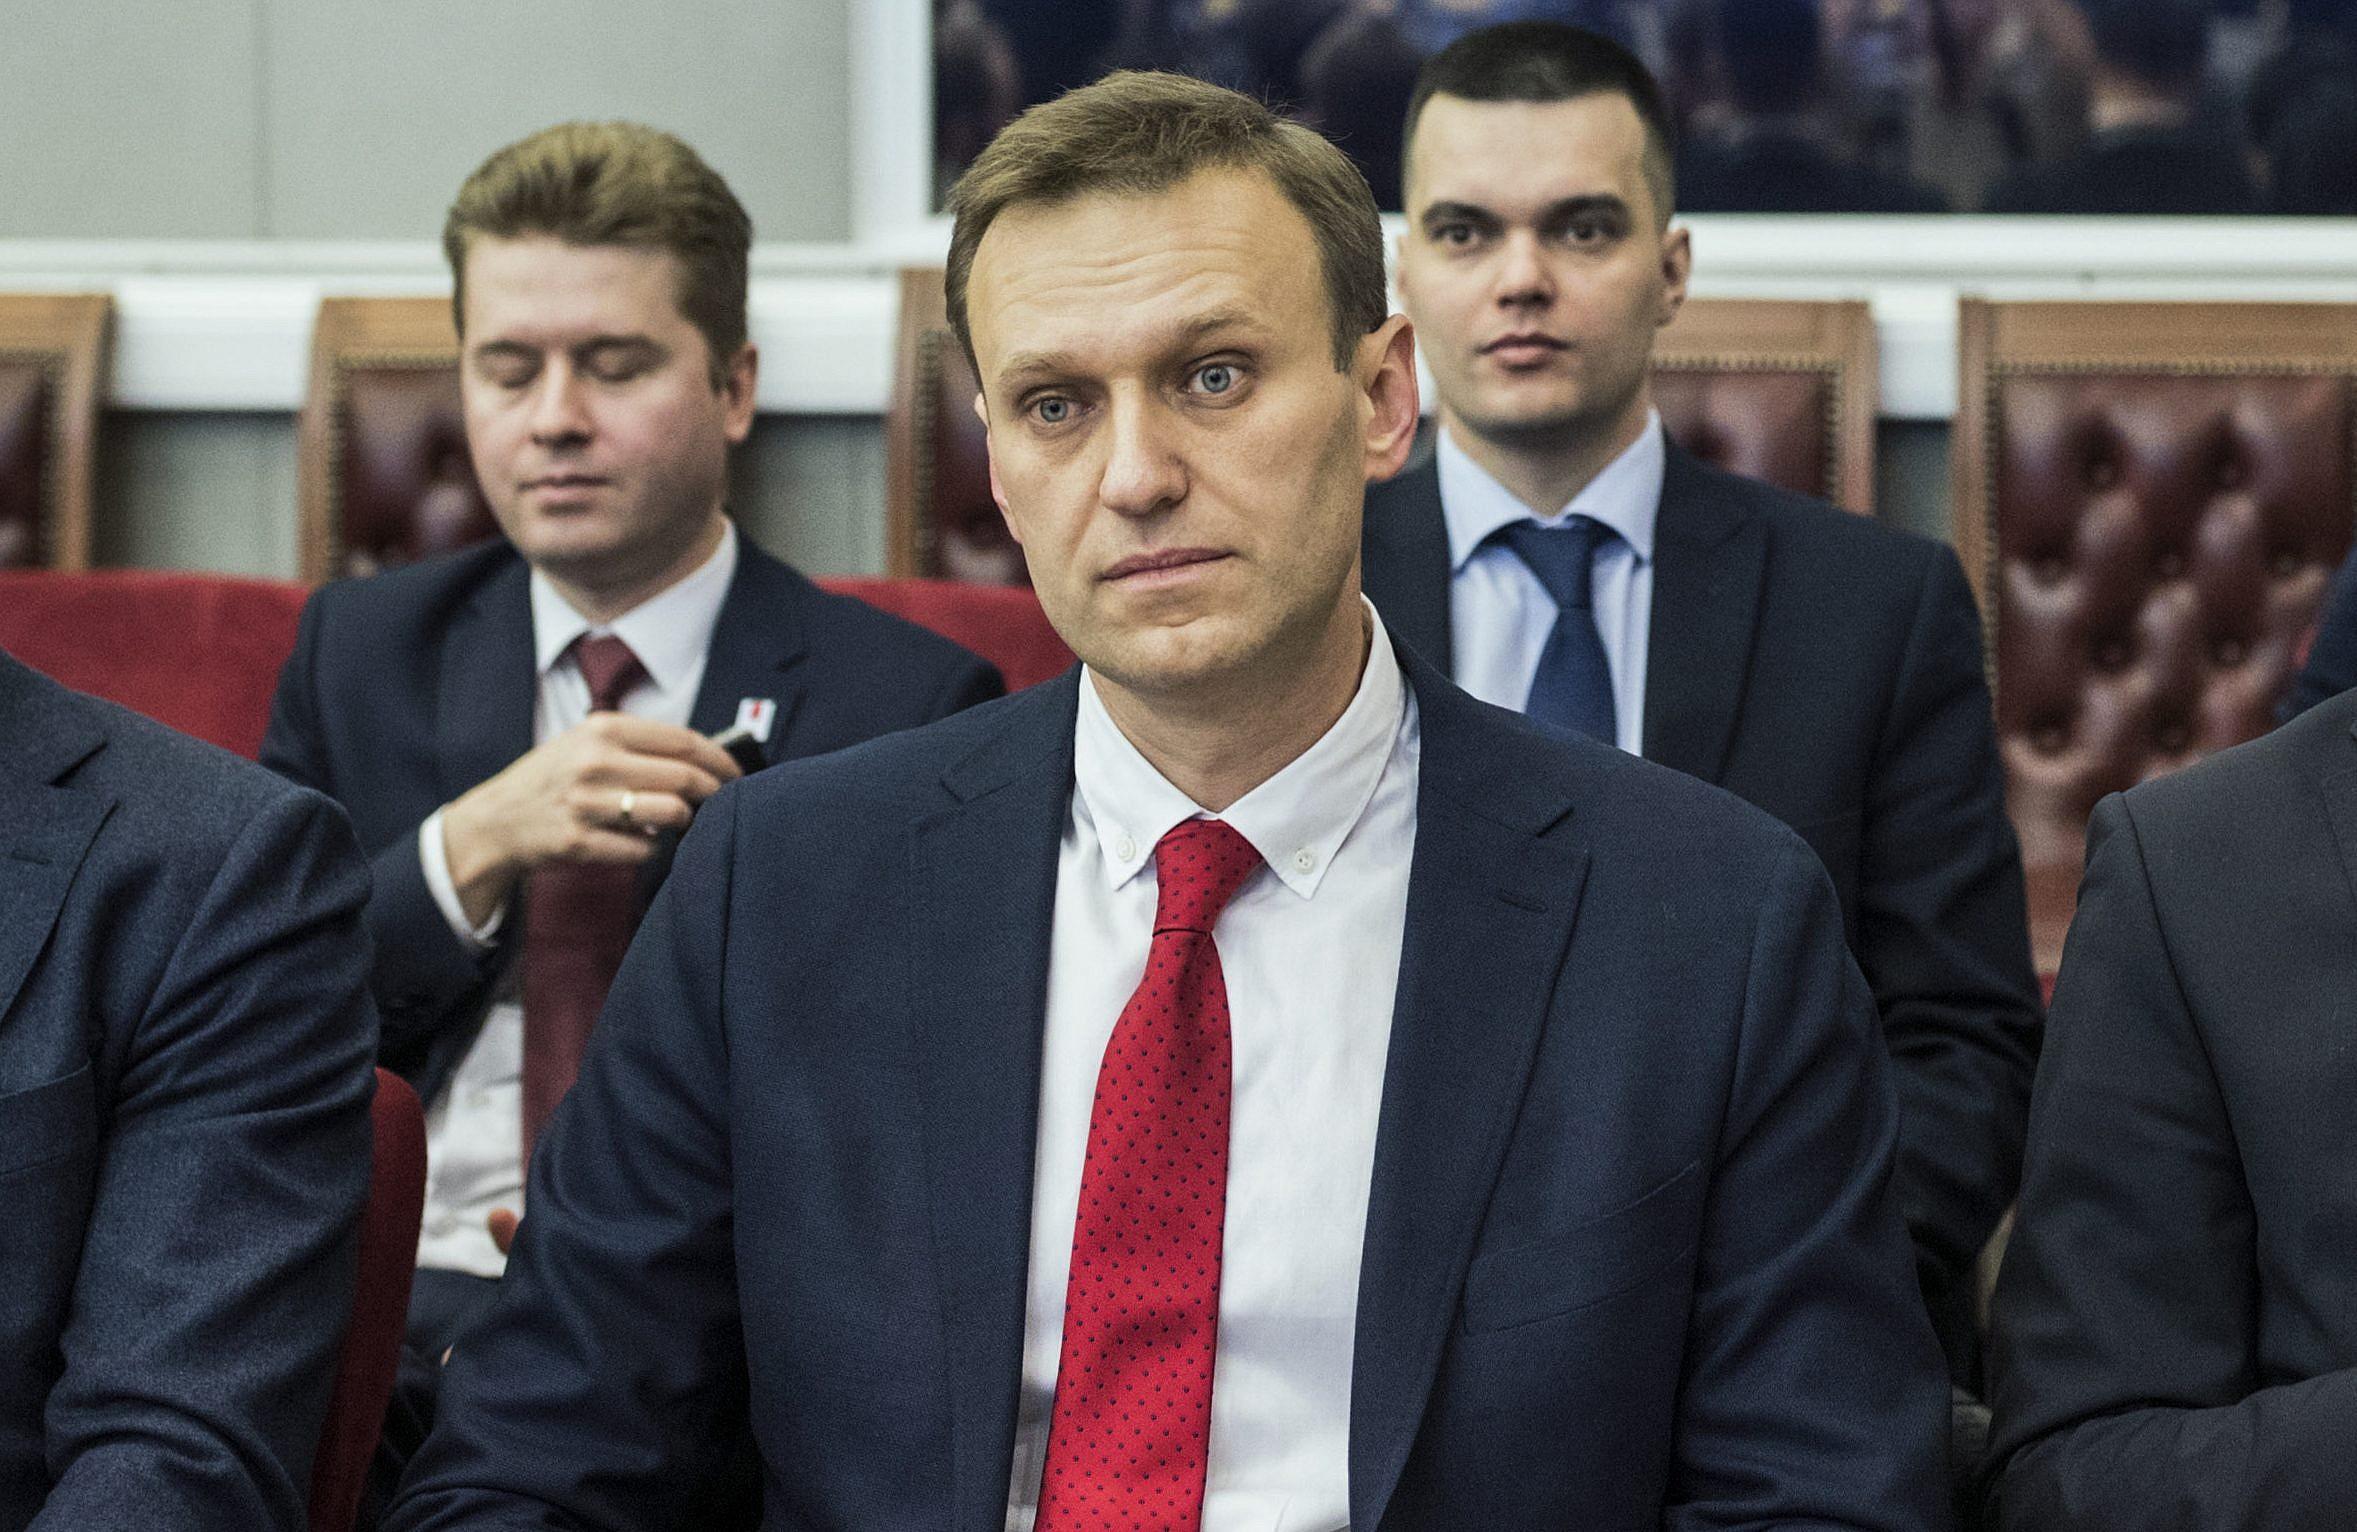 Putin oppositionen star for kaos